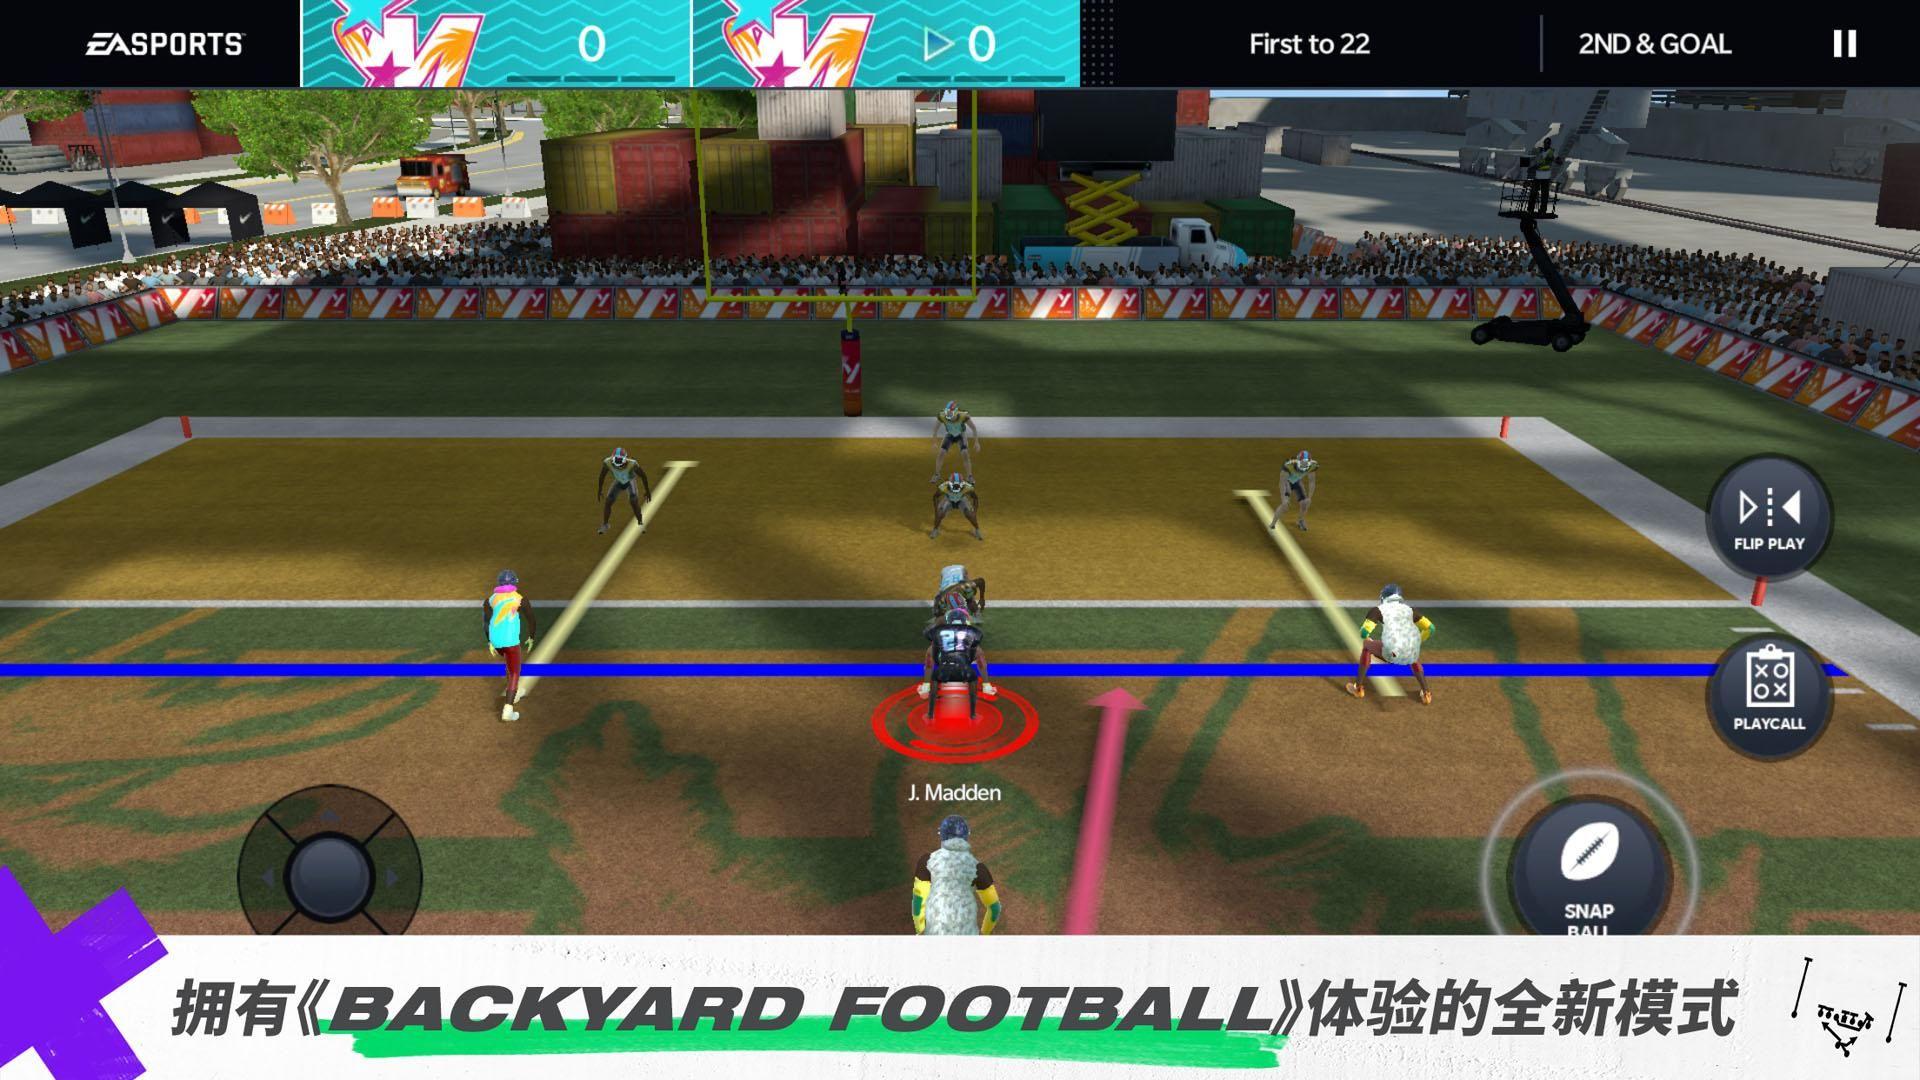 《Madden NFL 21 Mobile》橄榄球 游戏截图3